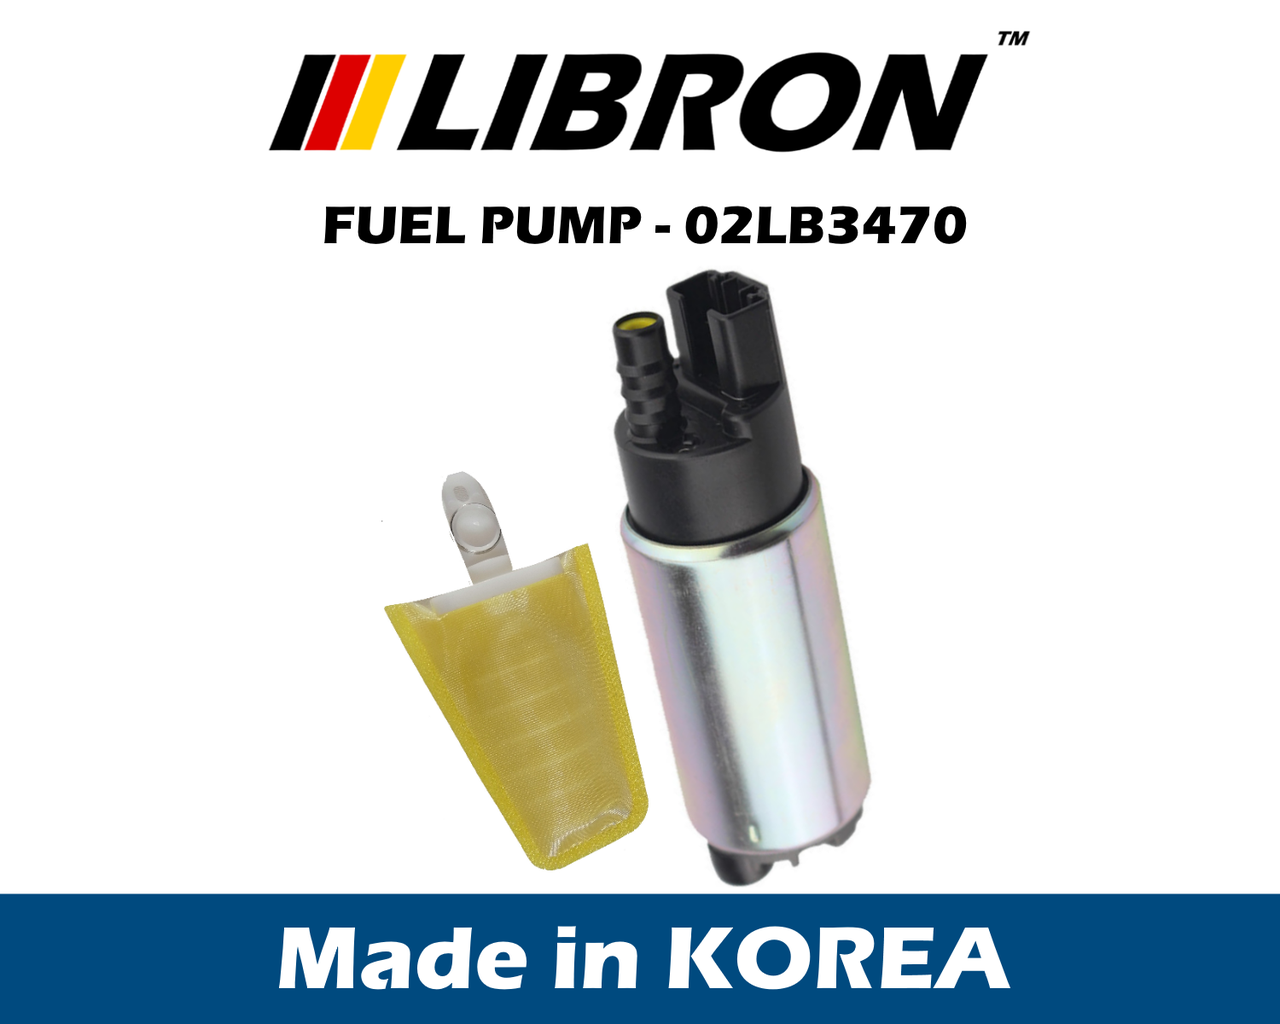 Топливный насос LIBRON 02LB3470 - MITSUBISHI SPACE WAGON (1992-1998)